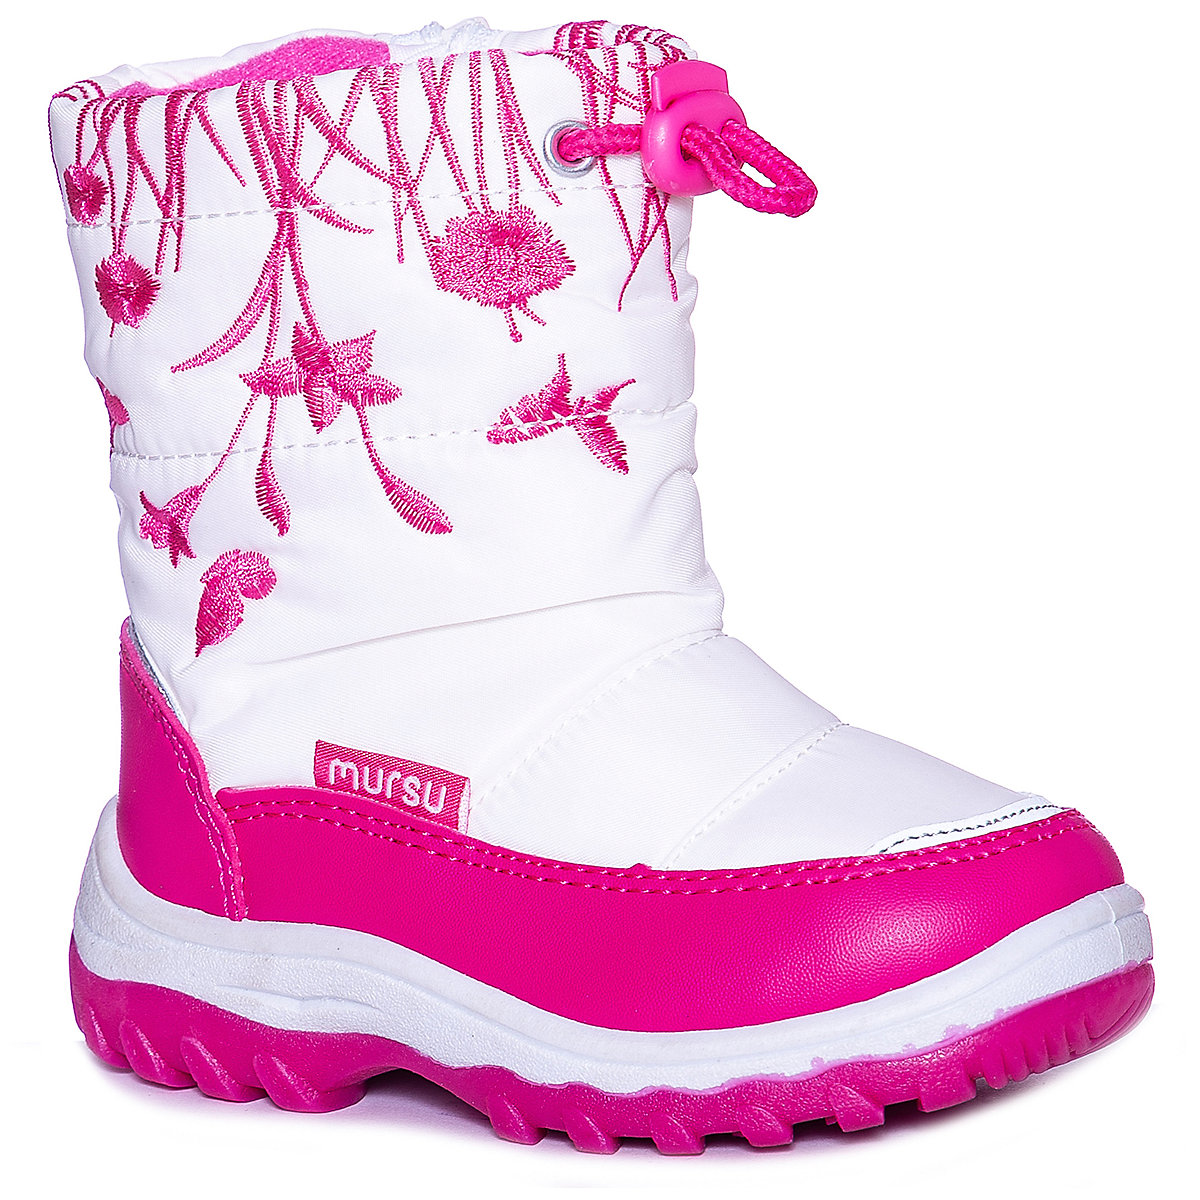 Bottes MURSU 8739369 hiver filles laine enfants chaussures fille MTpromo